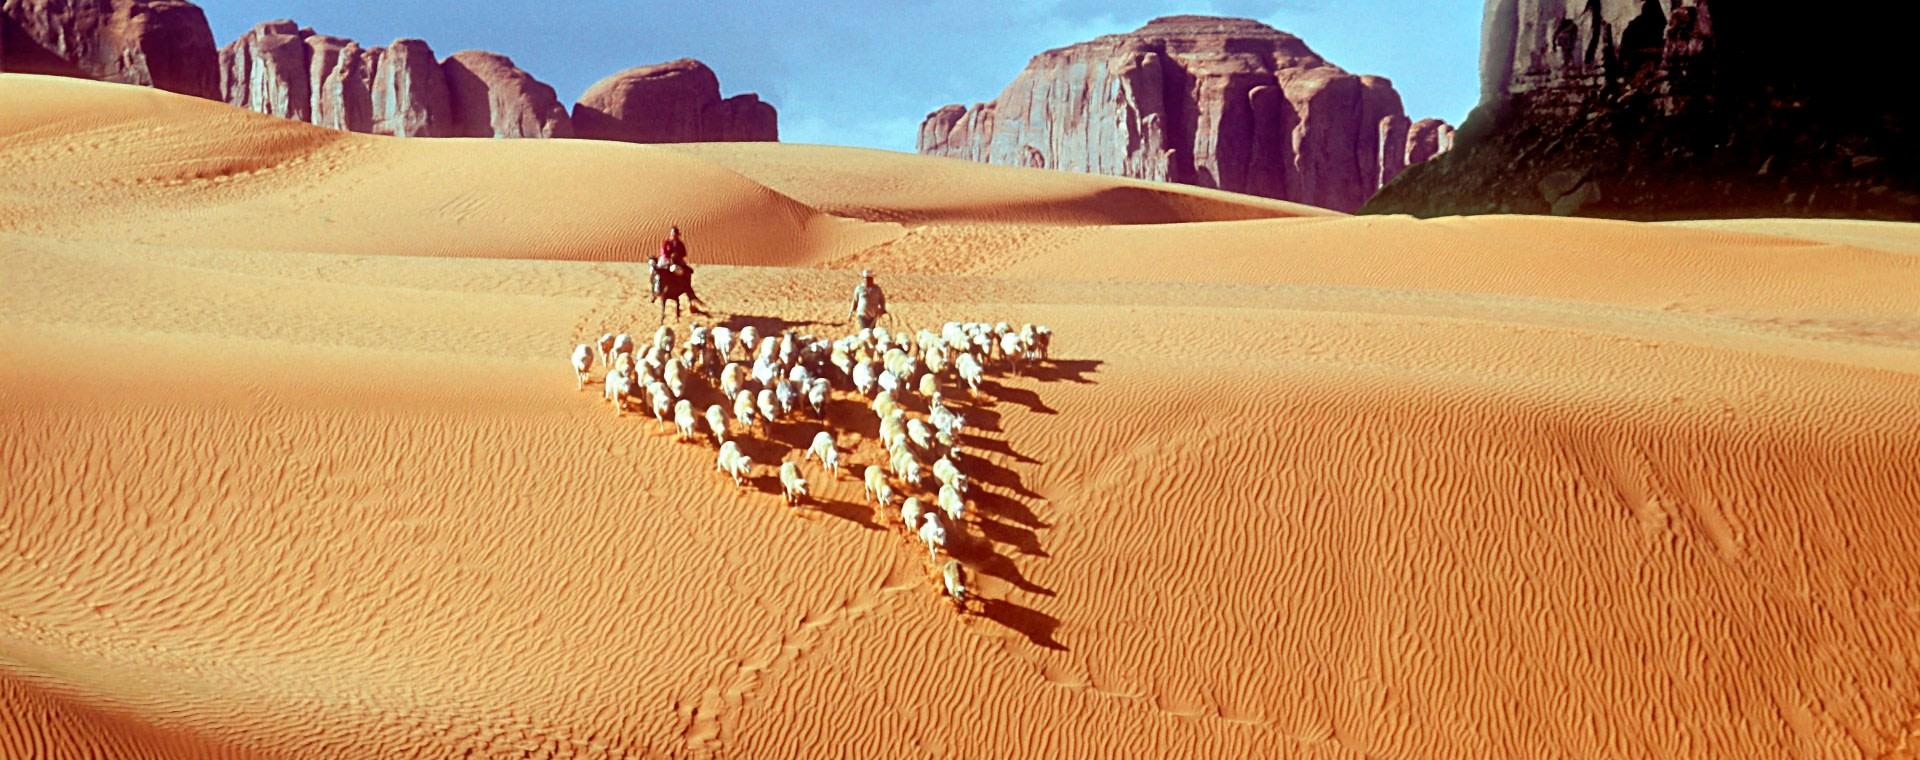 <div class='title'>           UCB #010 Driving Sheep         </div>